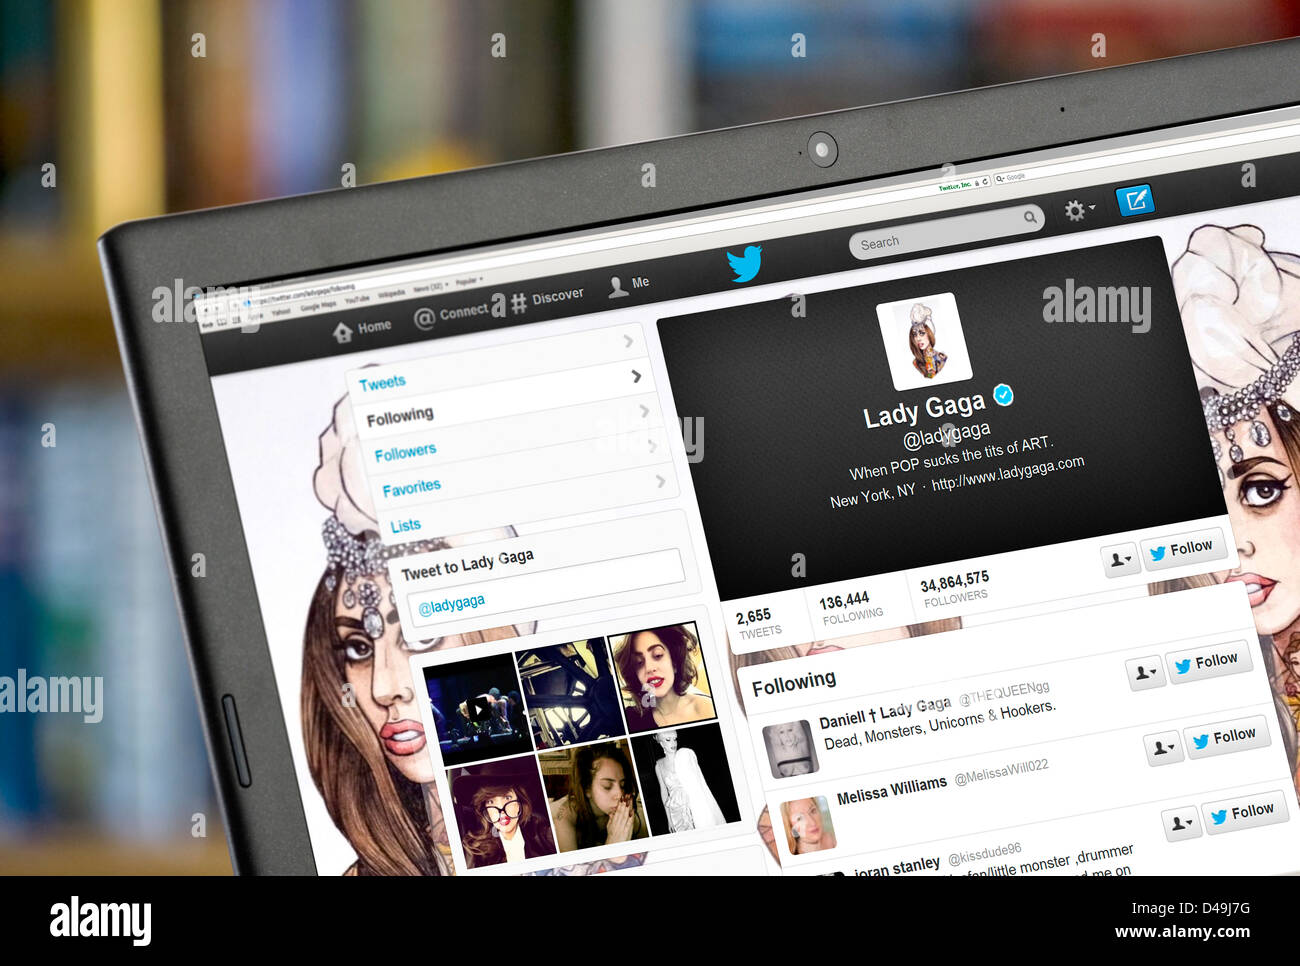 Lady Gaga's Twitter page d'un ordinateur portable Photo Stock